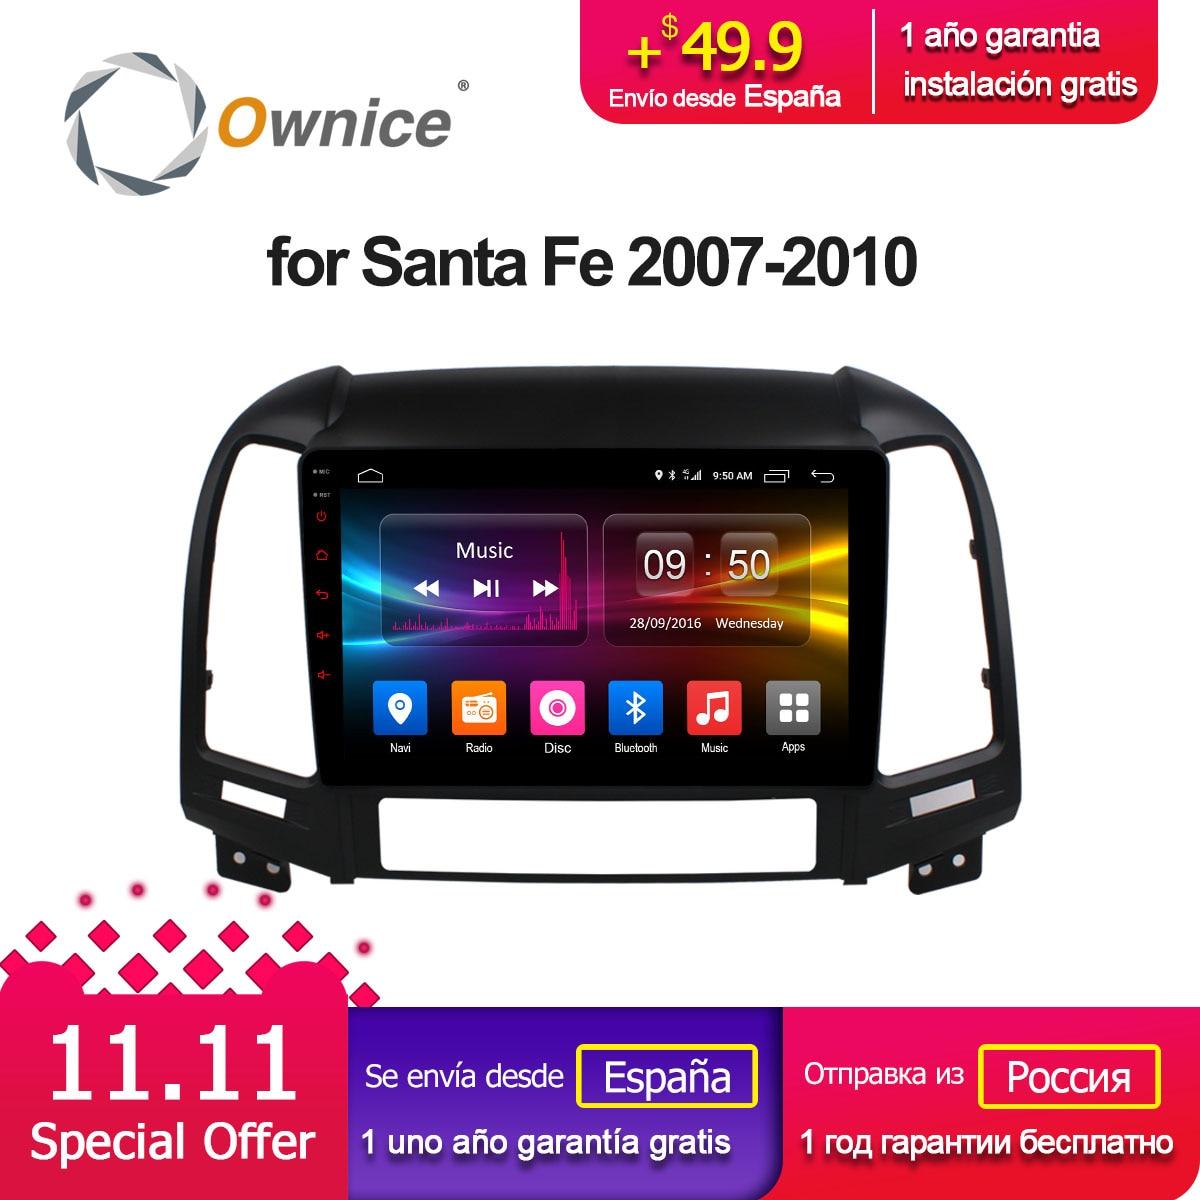 Ownice C500+ G10 Android 8.1 Octa Core for Hyundai Santa Fe 2007-2010 Car DVD gps raido audio navi player 32G ROM 2G RAM 4G SIM ownice c500 4g sim lte octa 8 core android 6 0 for kia ceed 2013 2015 car dvd player gps navi radio wifi 4g bt 2gb ram 32g rom